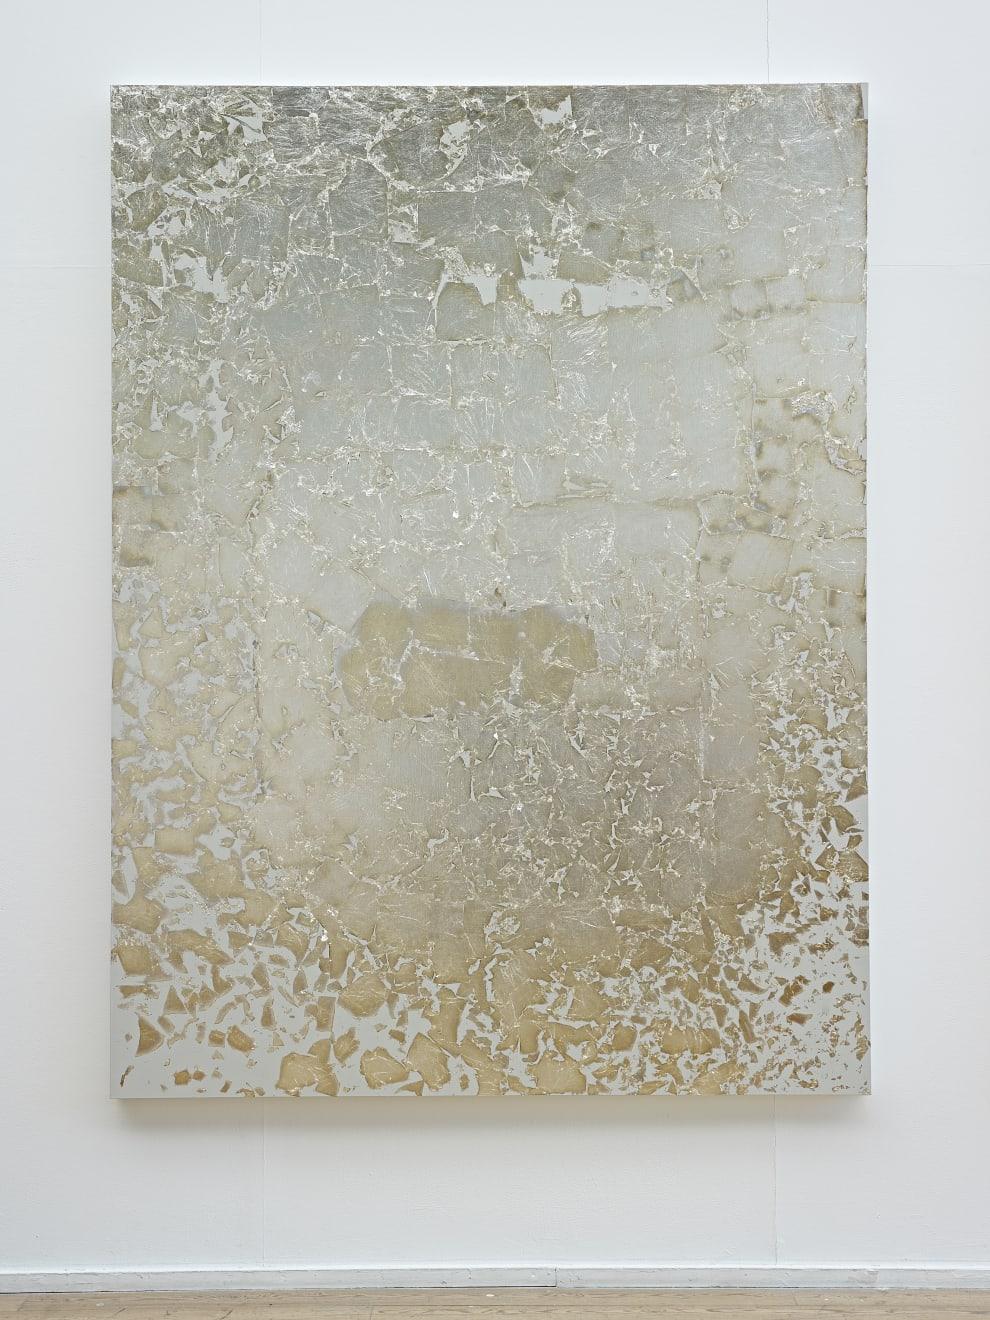 Jennifer Douglas, A Tacit Understanding (Silver), 2017